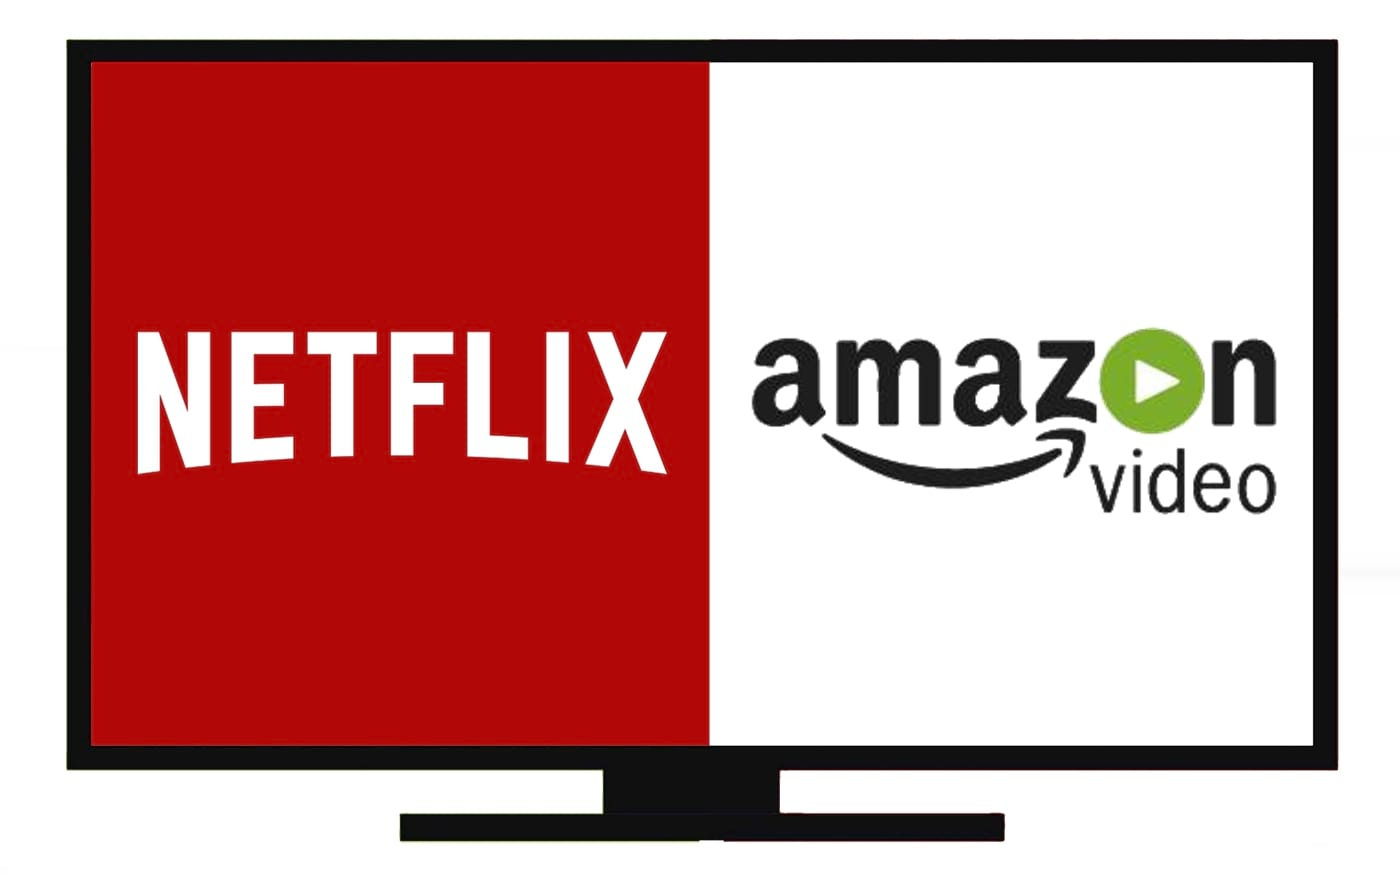 Vale a pena trocar a Netflix pelo Amazon Prime Video?